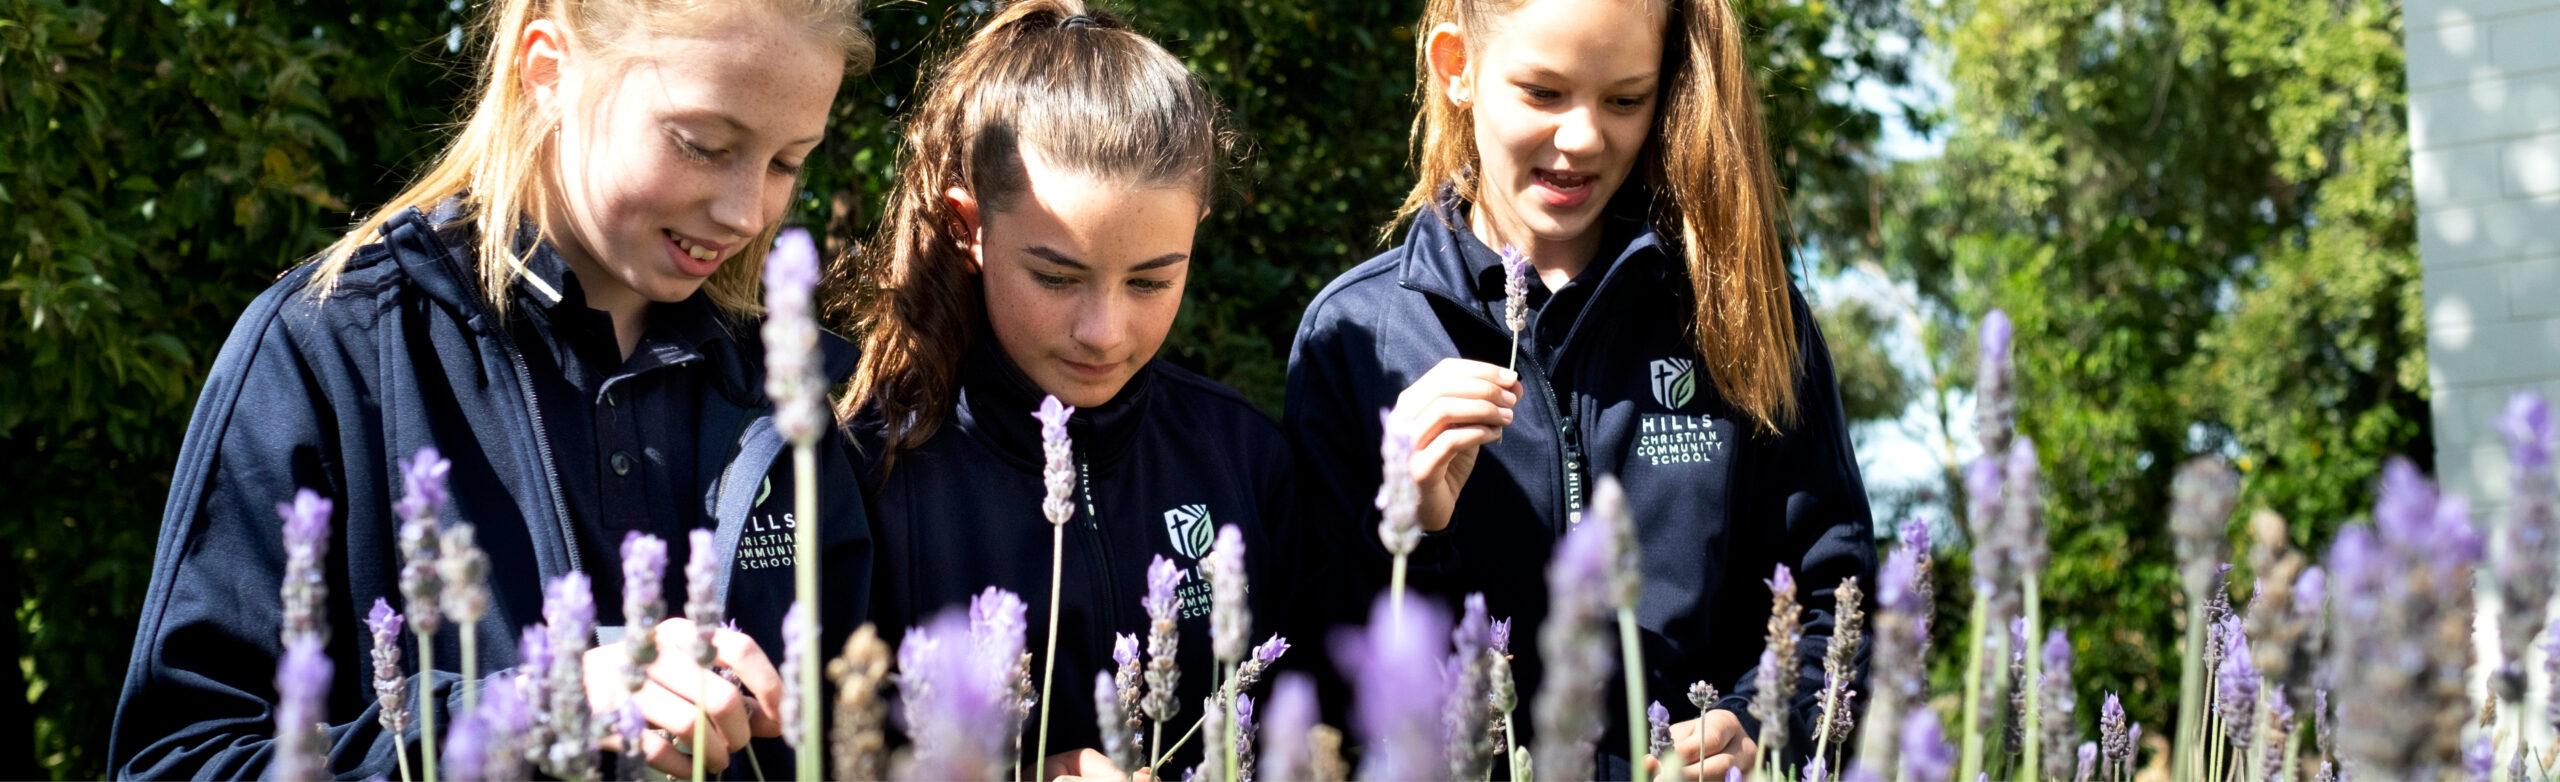 Hills School Verdun Learning Prospectus